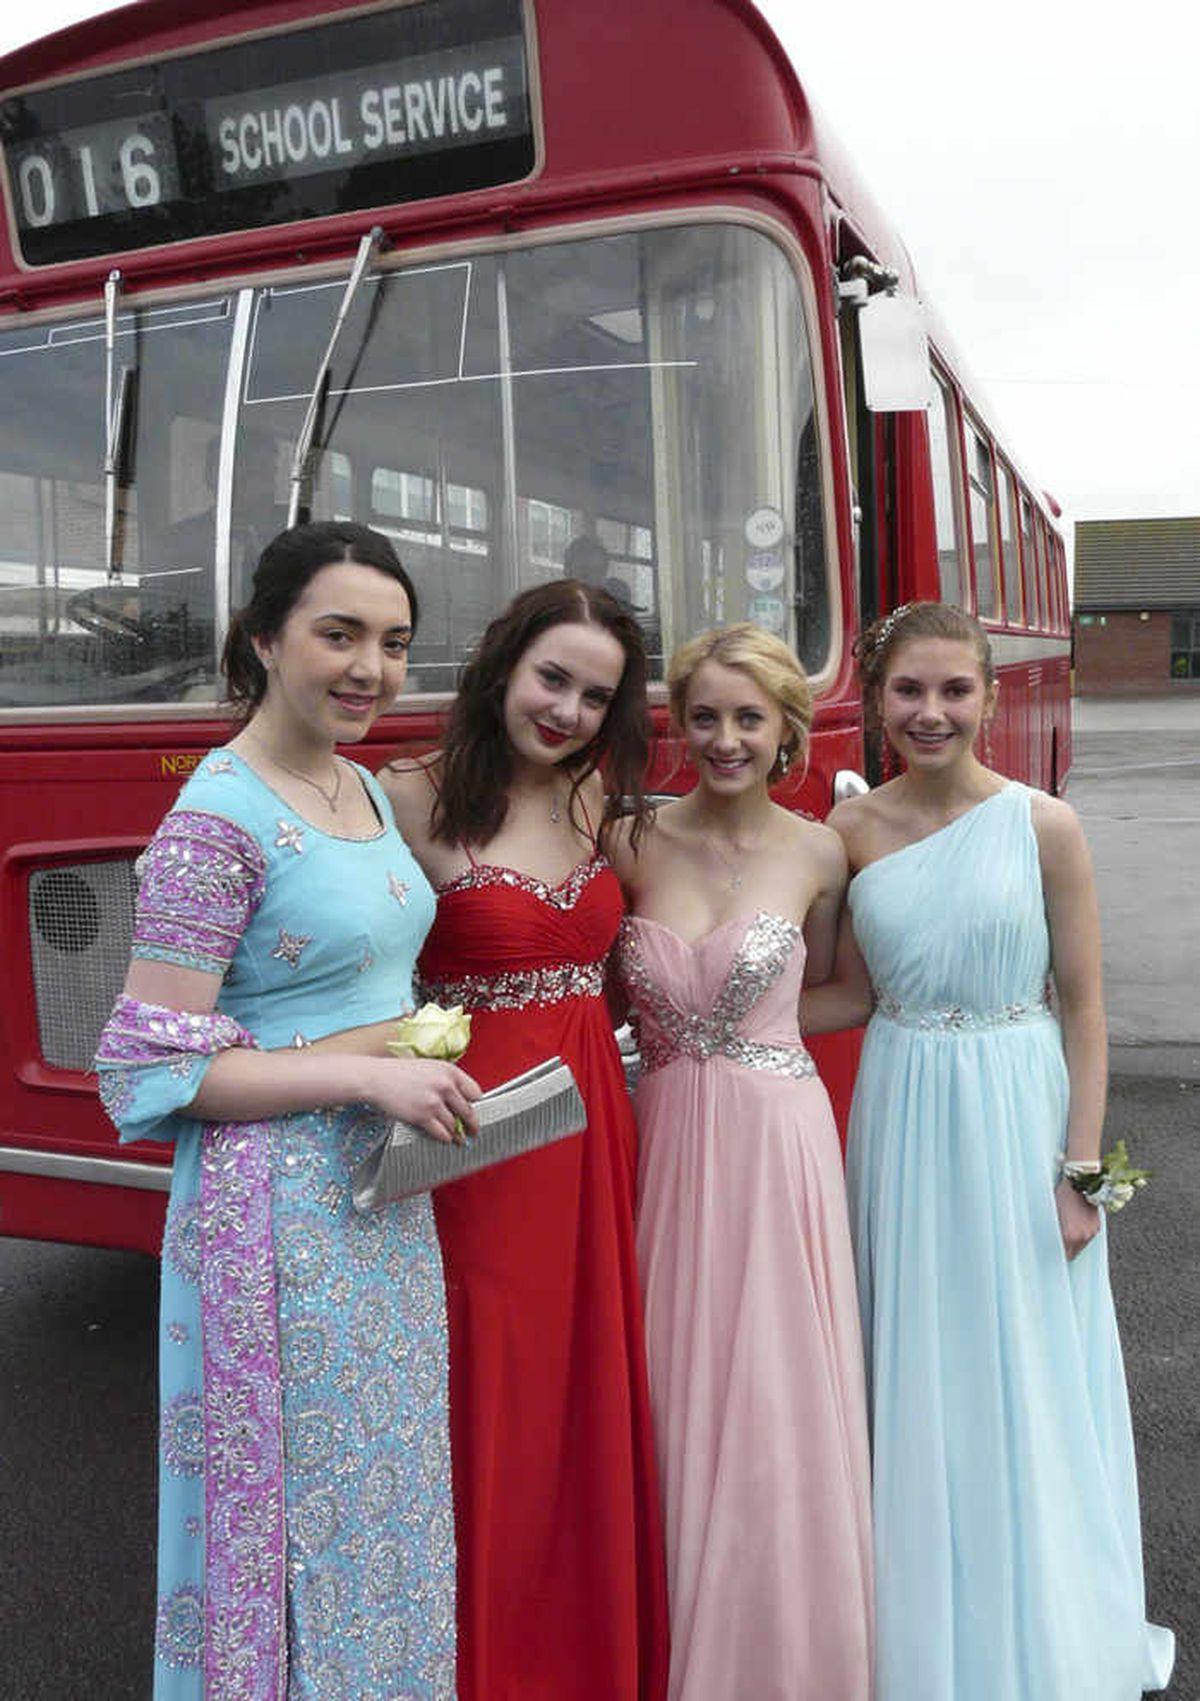 It was a journey by old-fashioned bus for Naomi Yates, Emily Jones, Chloe Hammond and Ffion Jones at at Grange School, Shrewsbury